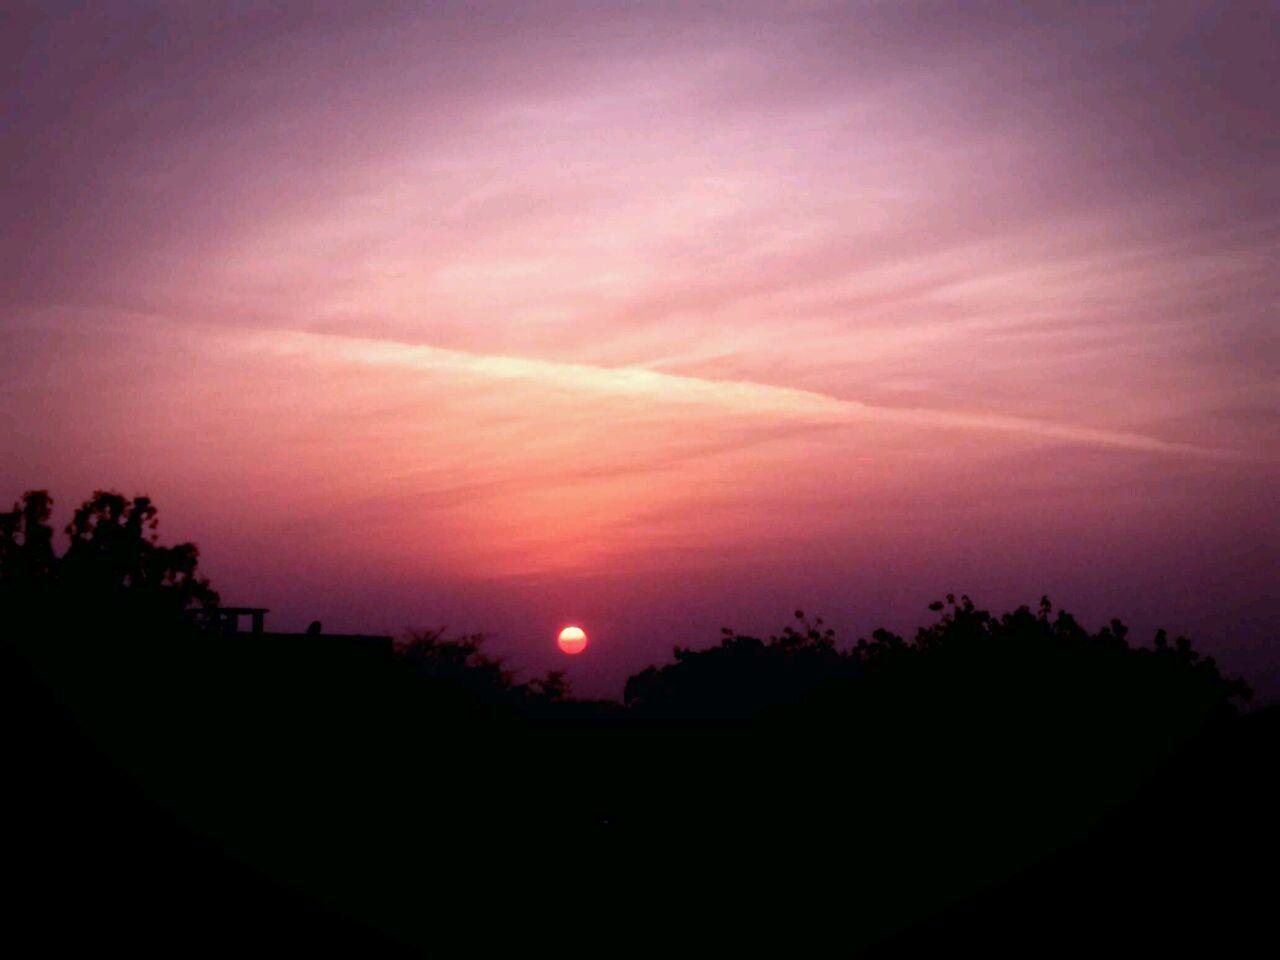 Sunset The Most Beautiful View Quotes Shayari Story Poem Jo